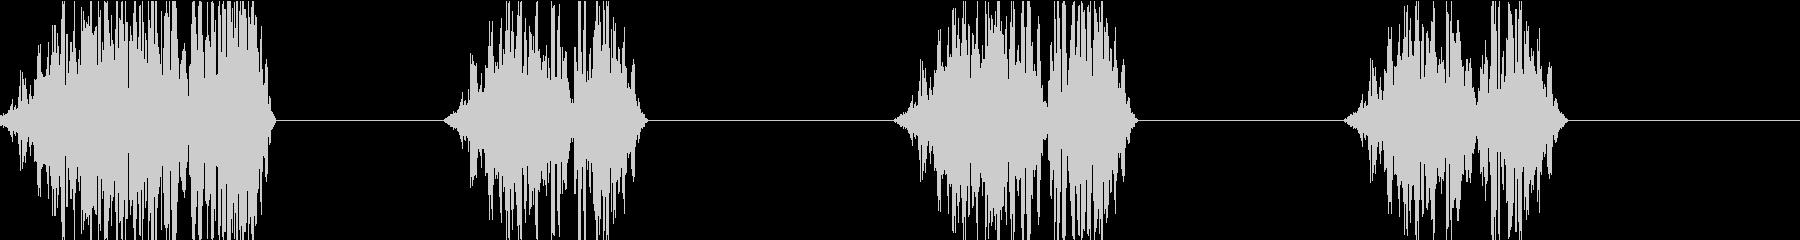 DJプレイ スクラッチ・ノイズ 202の未再生の波形